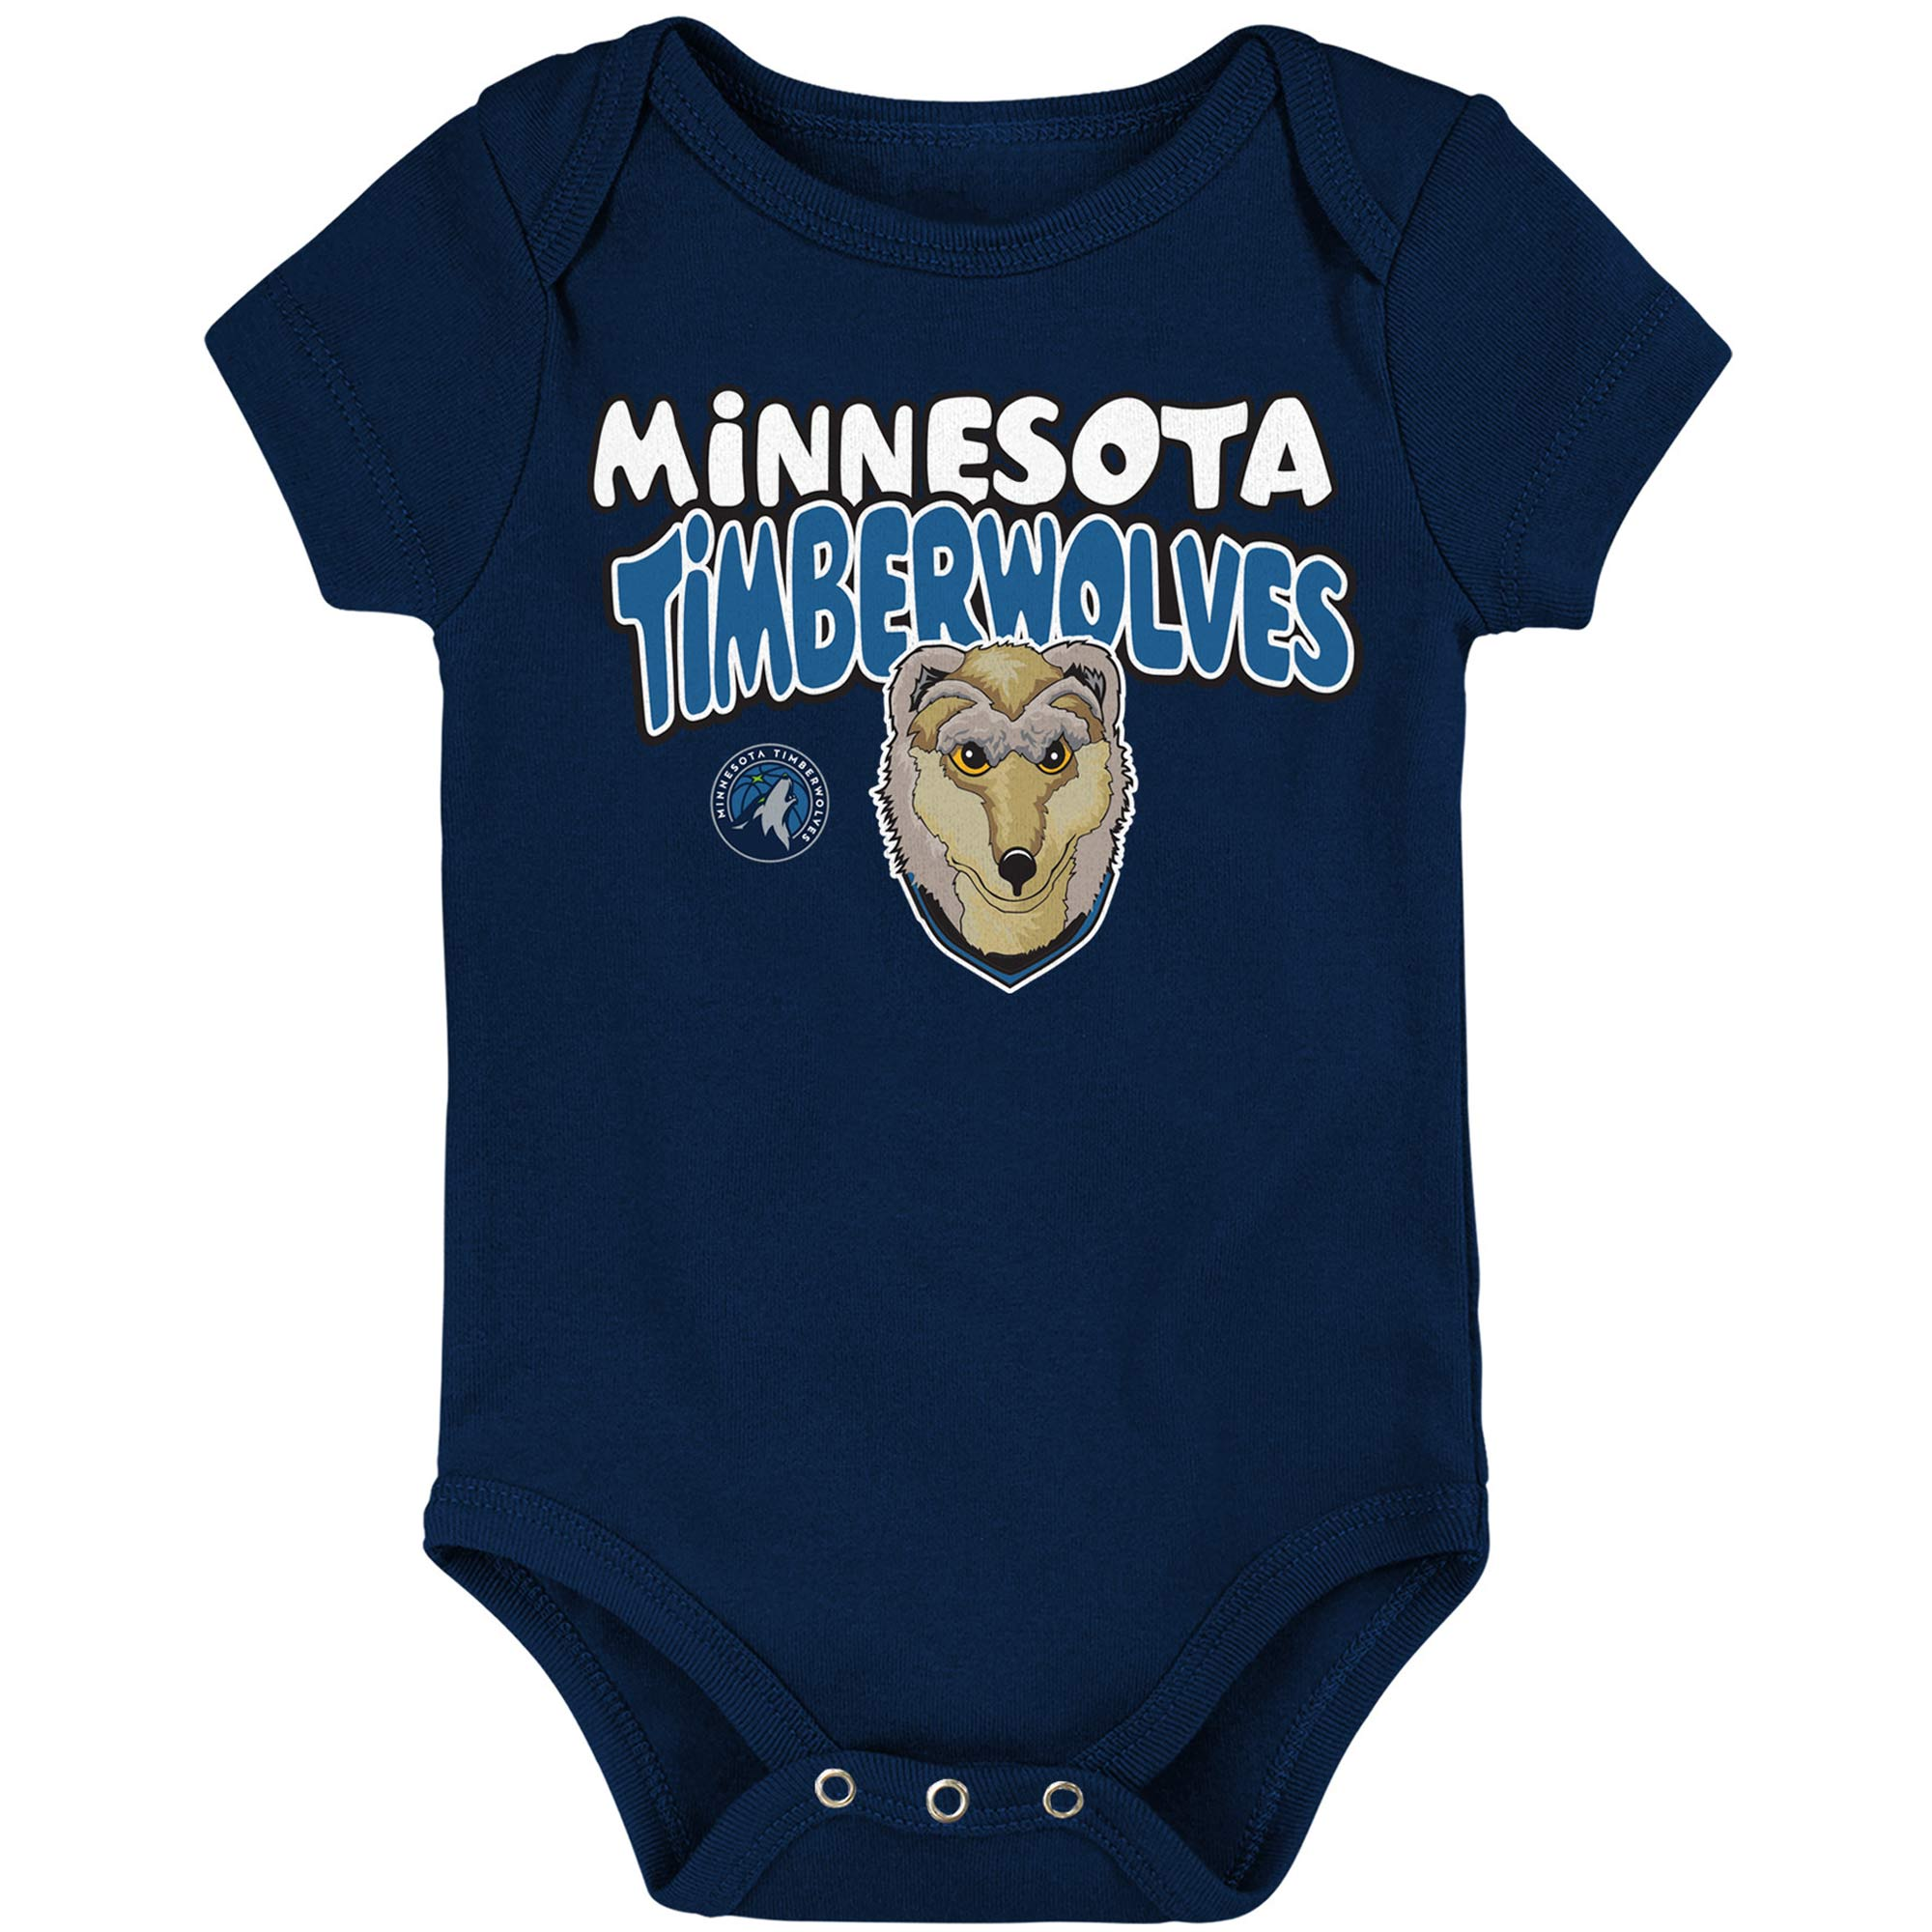 Minnesota Timberwolves Infant Bubble Letter Bodysuit - Navy